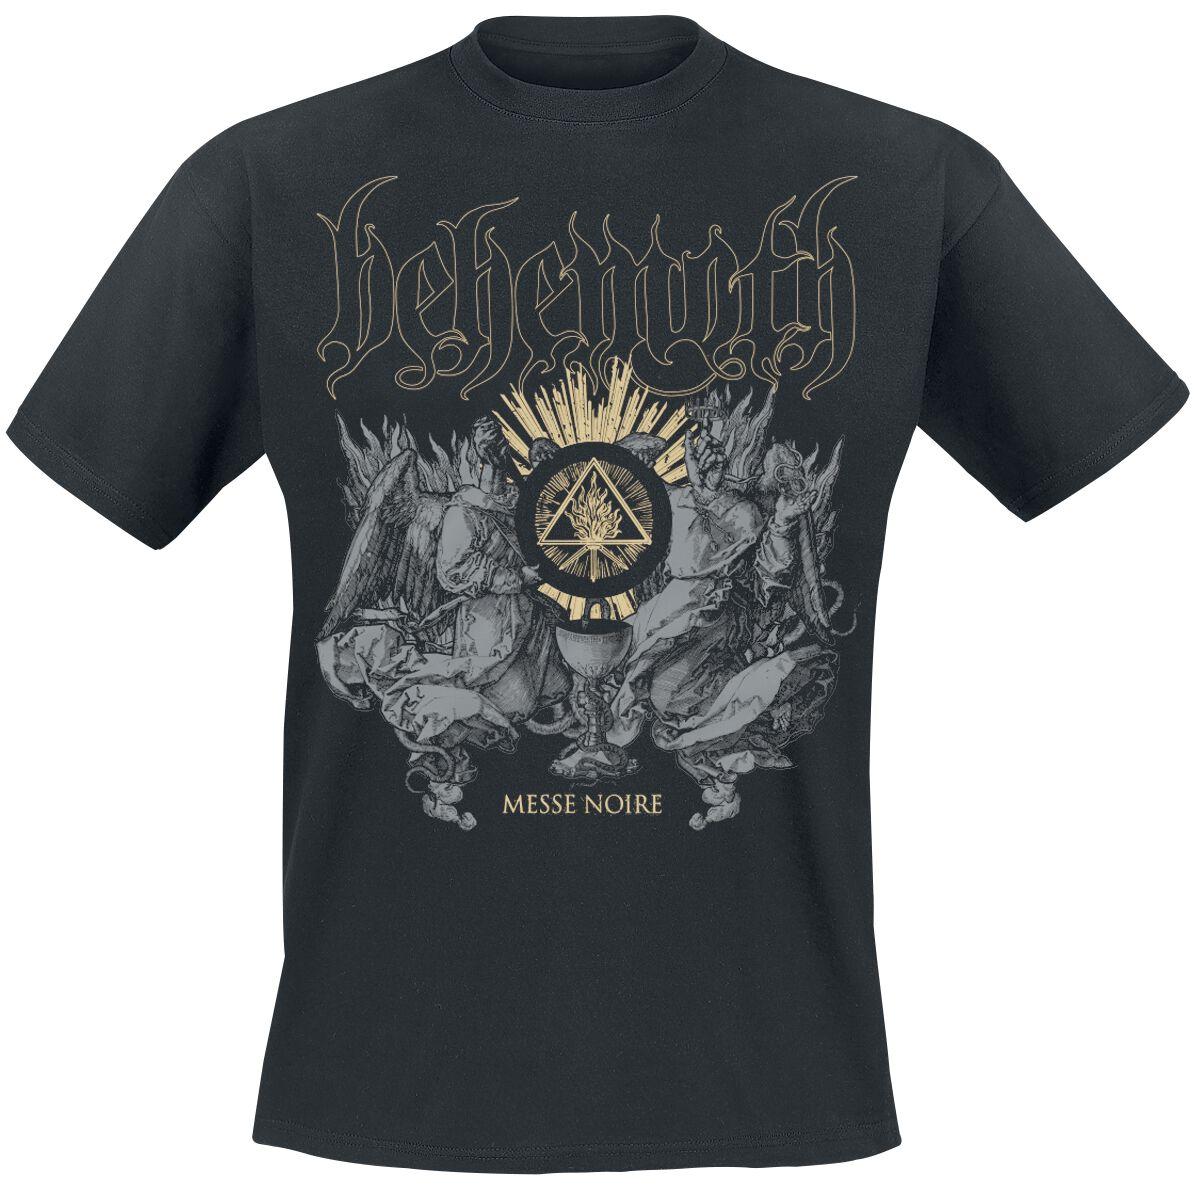 Zespoły - Koszulki - T-Shirt Behemoth Messe Noire T-Shirt czarny - 354075